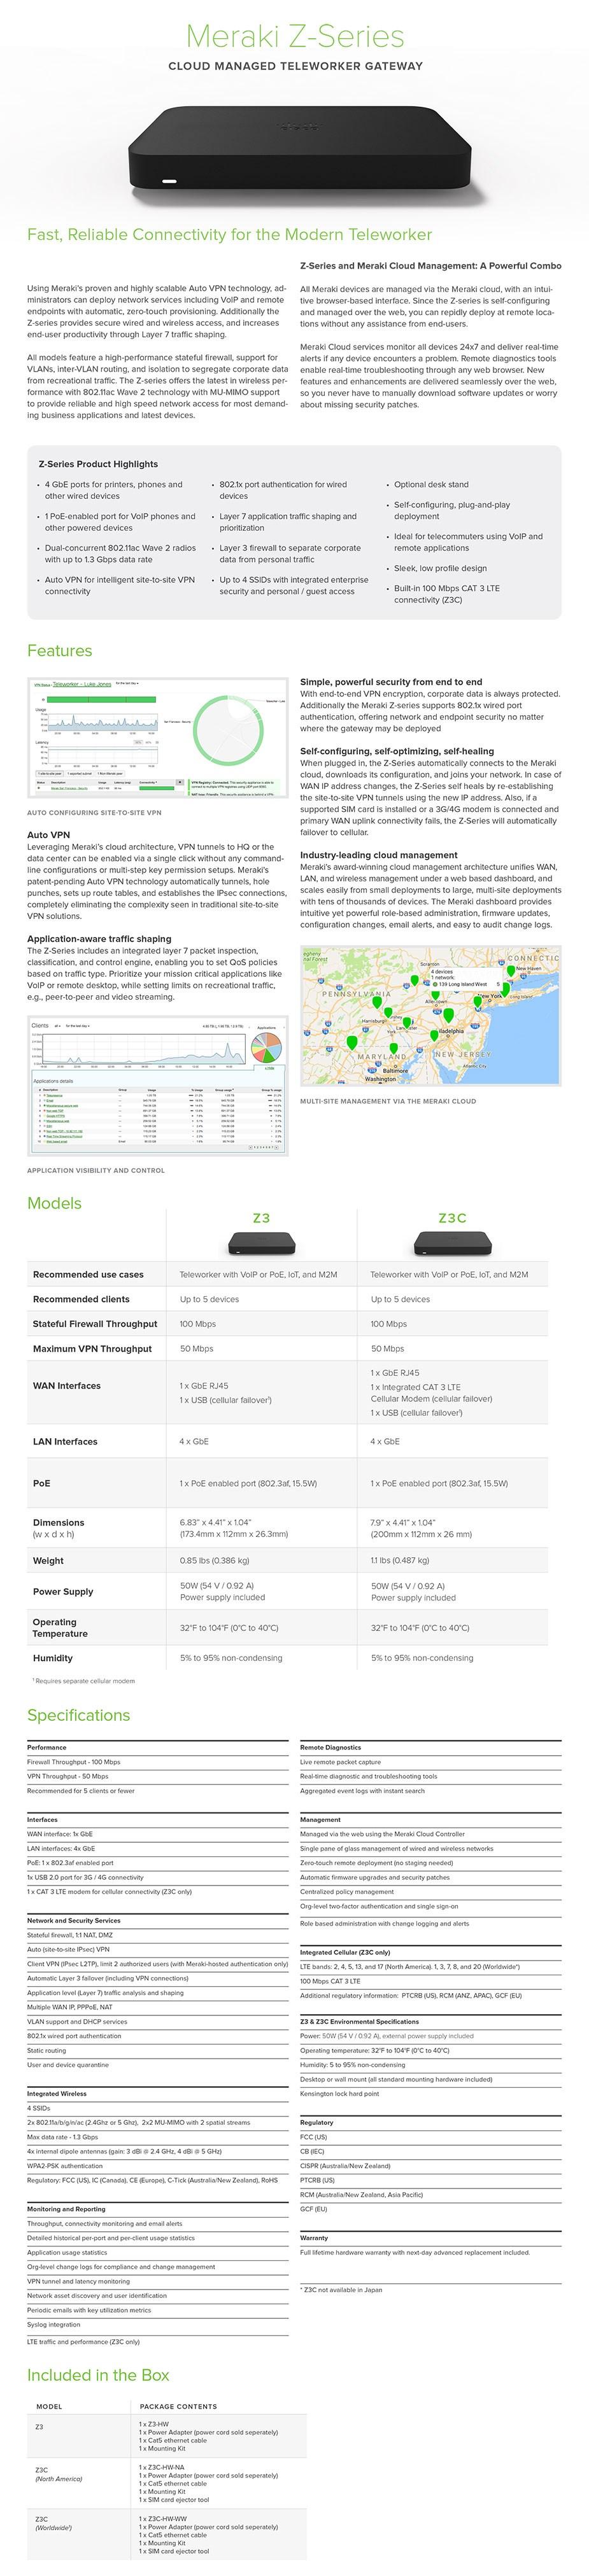 cisco-meraki-z3c-cloud-managed-lte-teleworker-gateway-ac31208-2.jpg